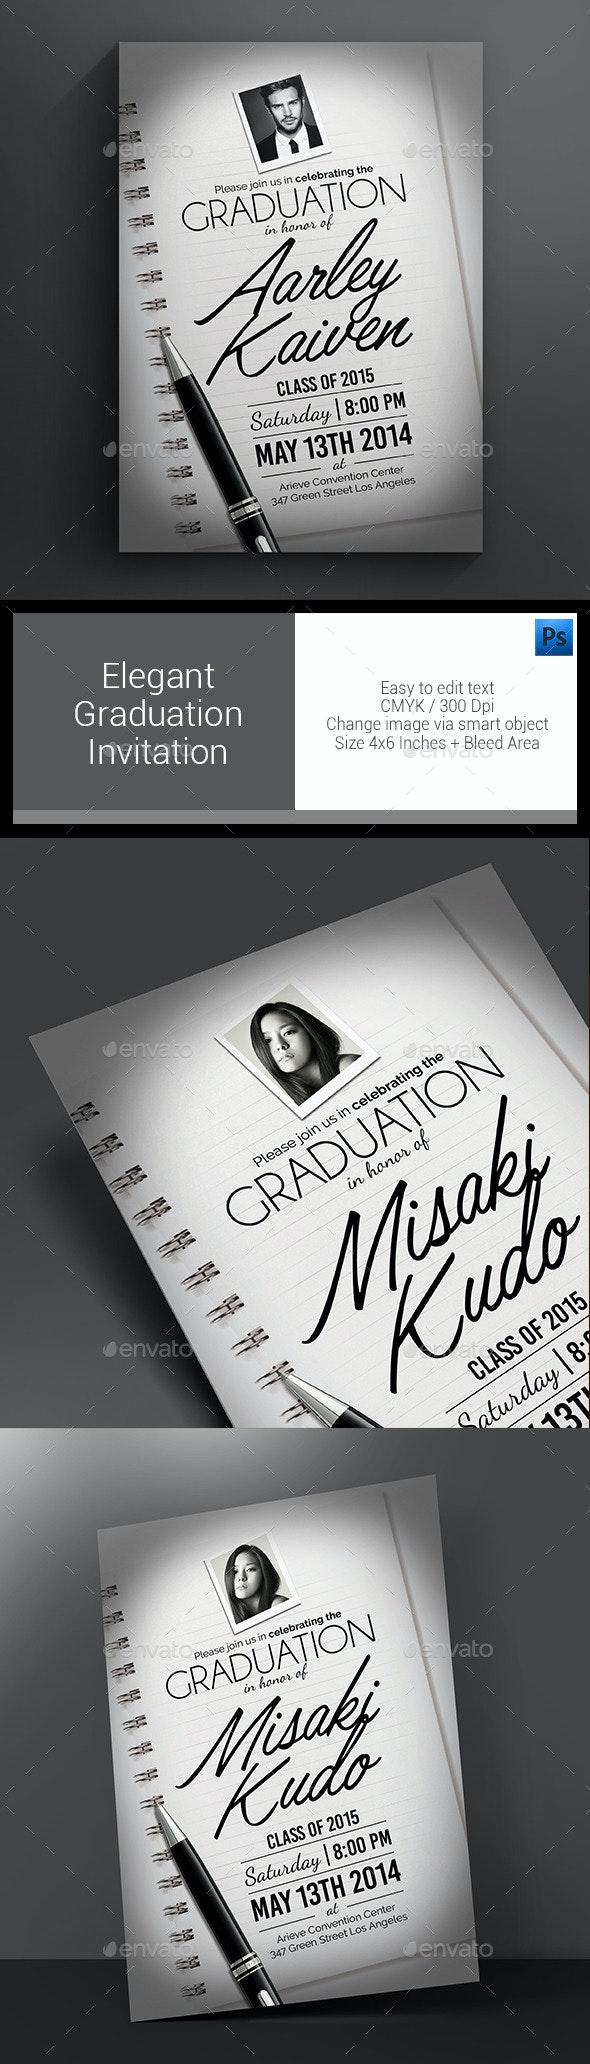 Elegant Graduation Invitation - Invitations Cards & Invites